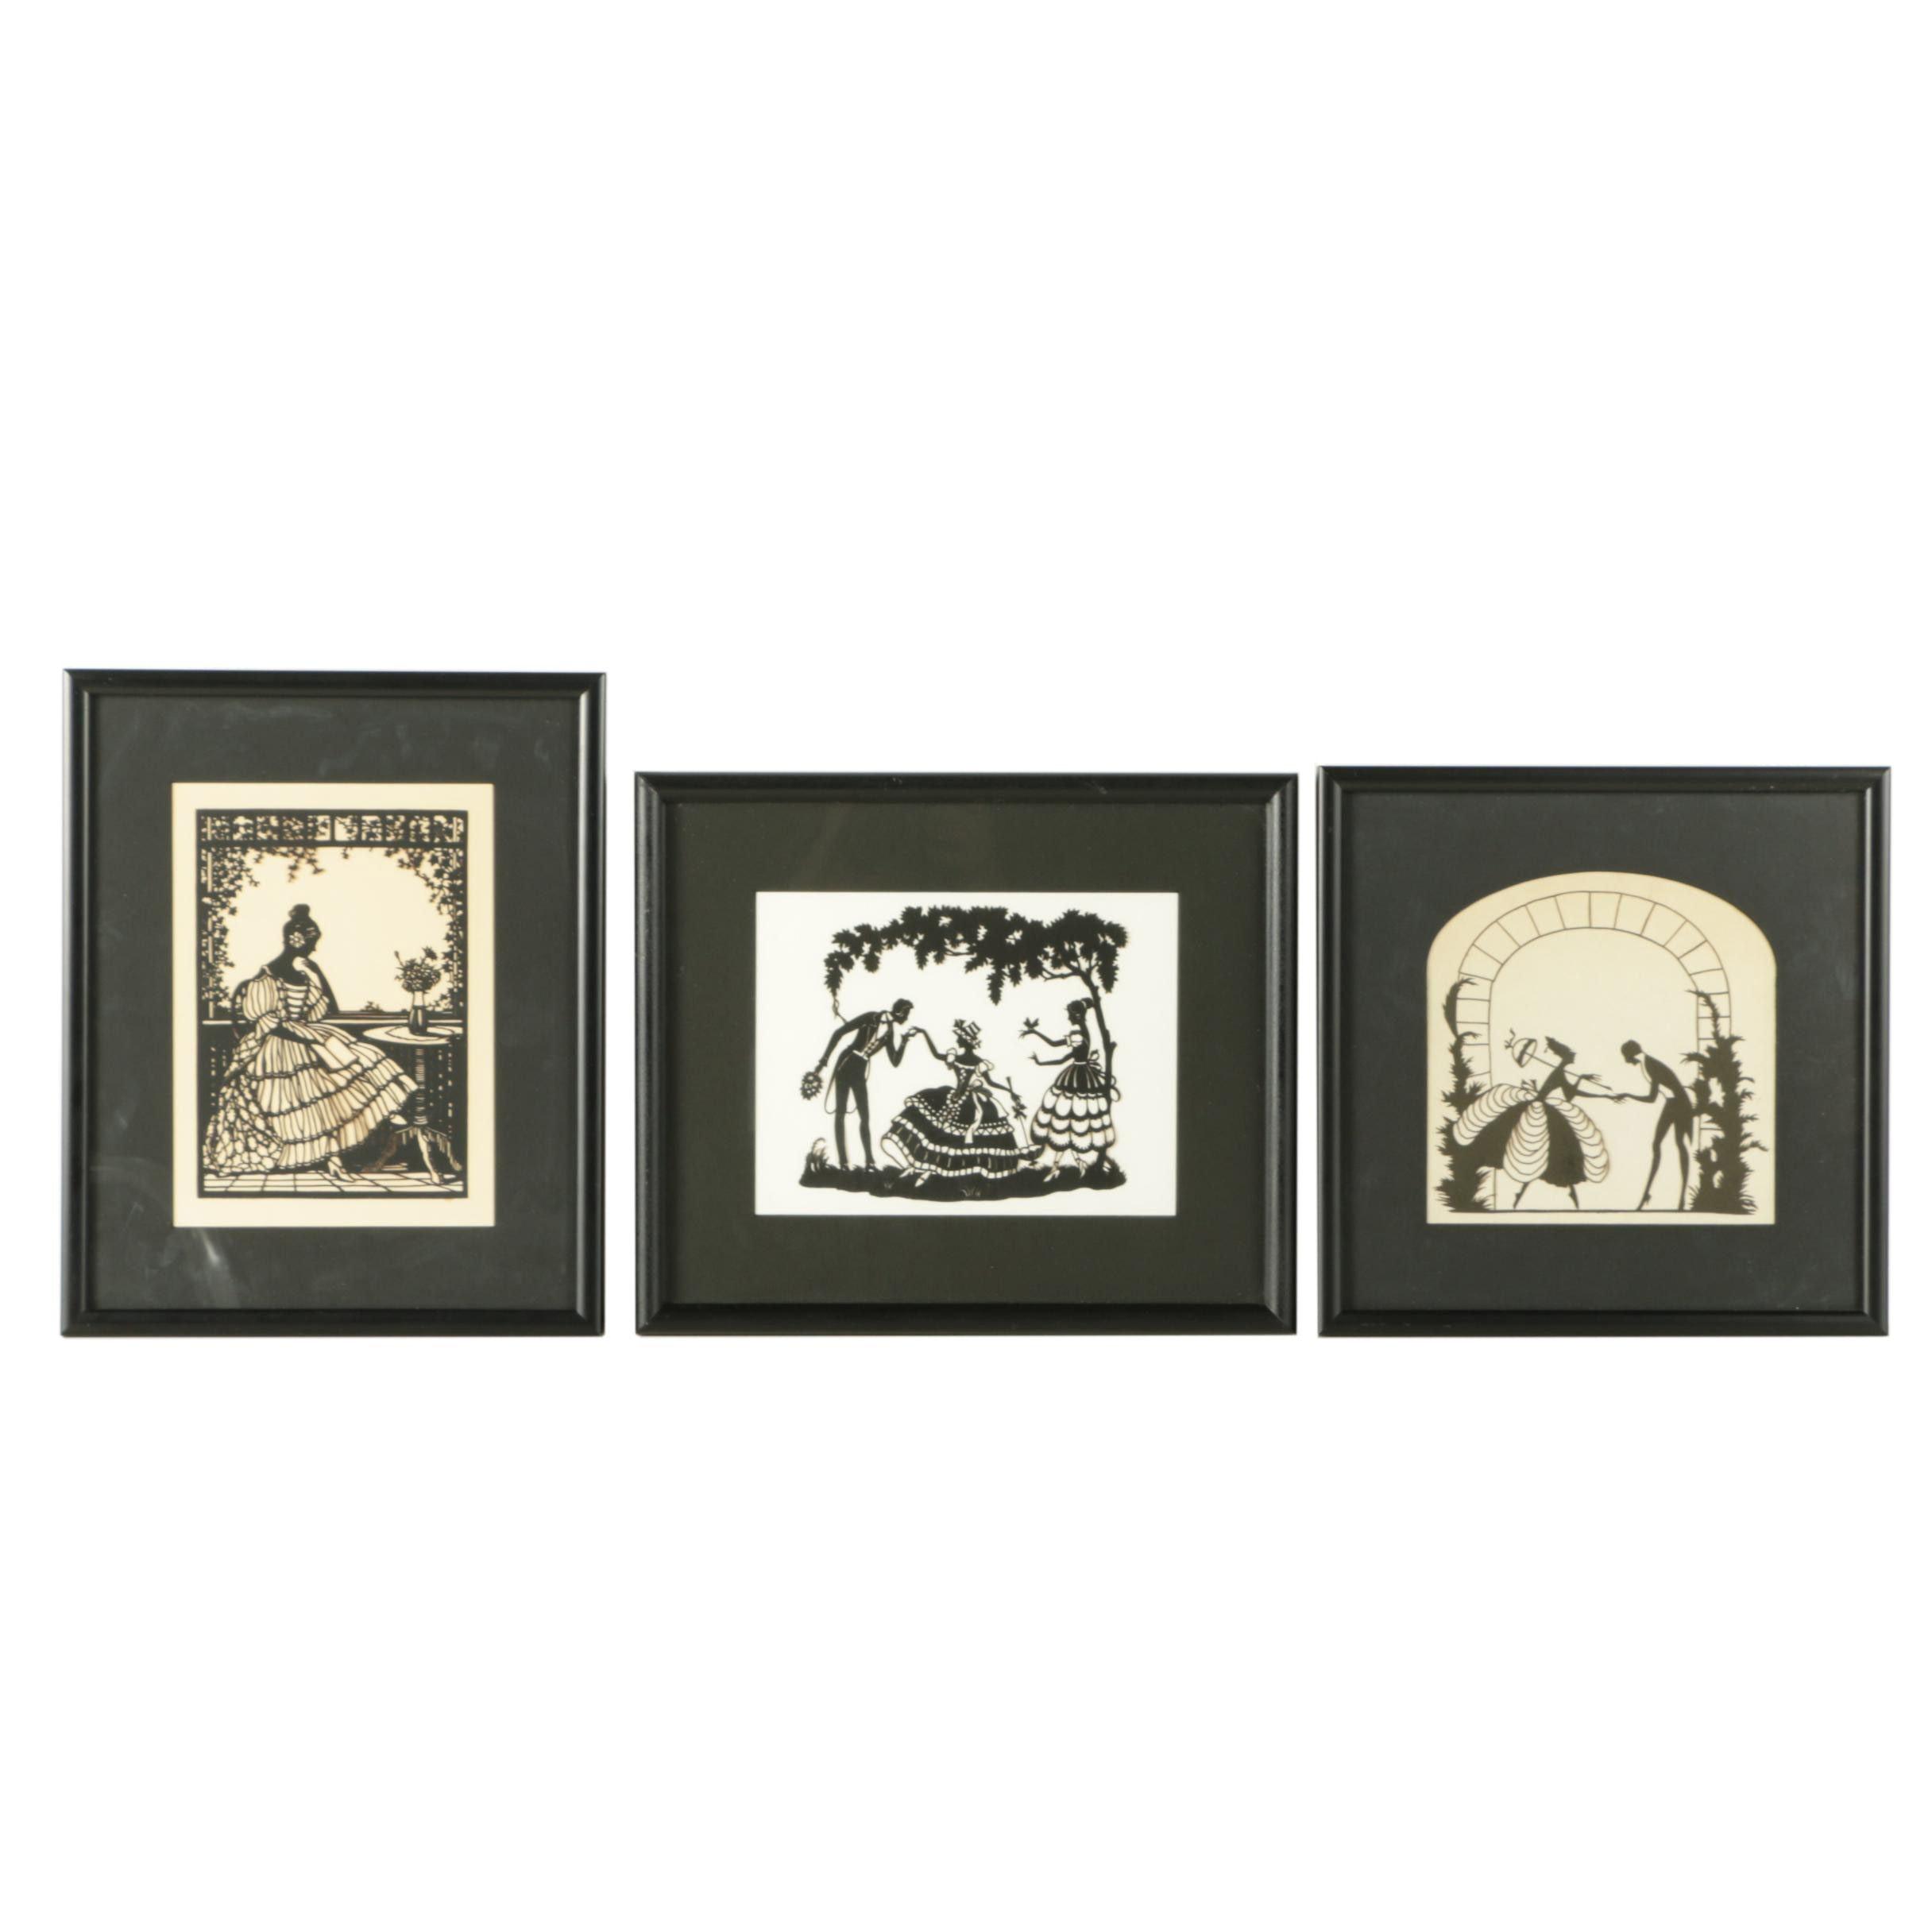 Set of Three Cut Paper Silhouettes of Genre Scenes